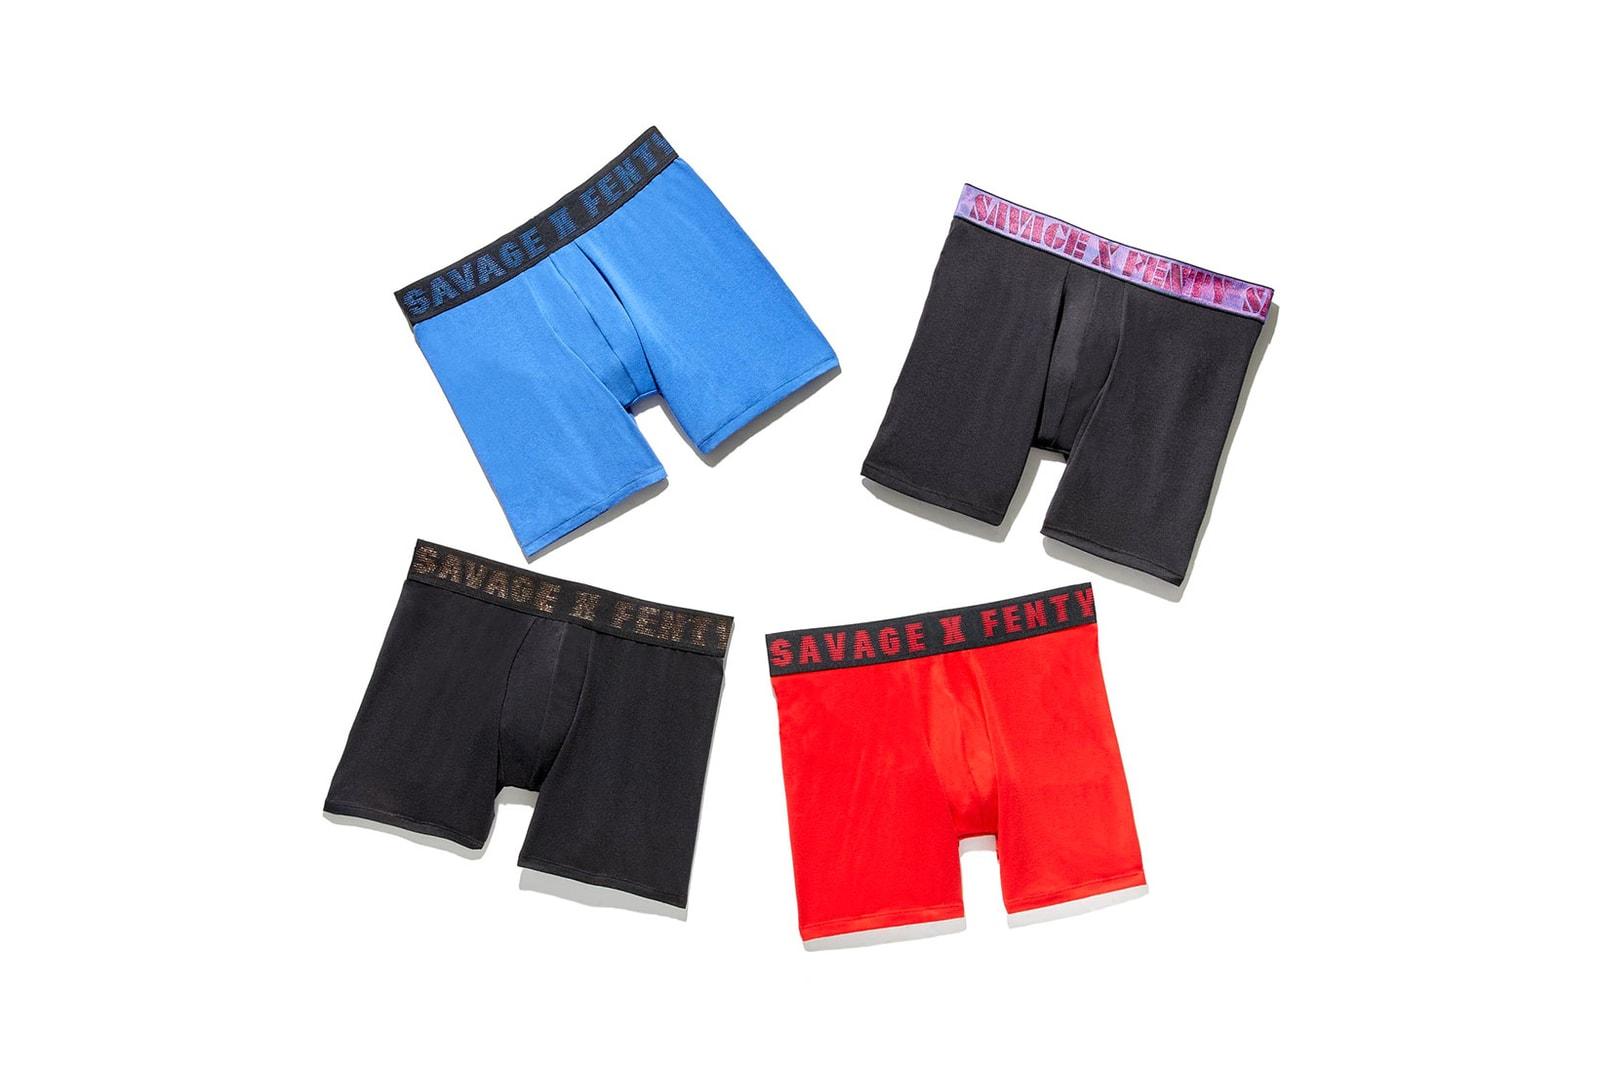 Rihanna Savage X Fenty September Collection Lingerie Underwear Bras